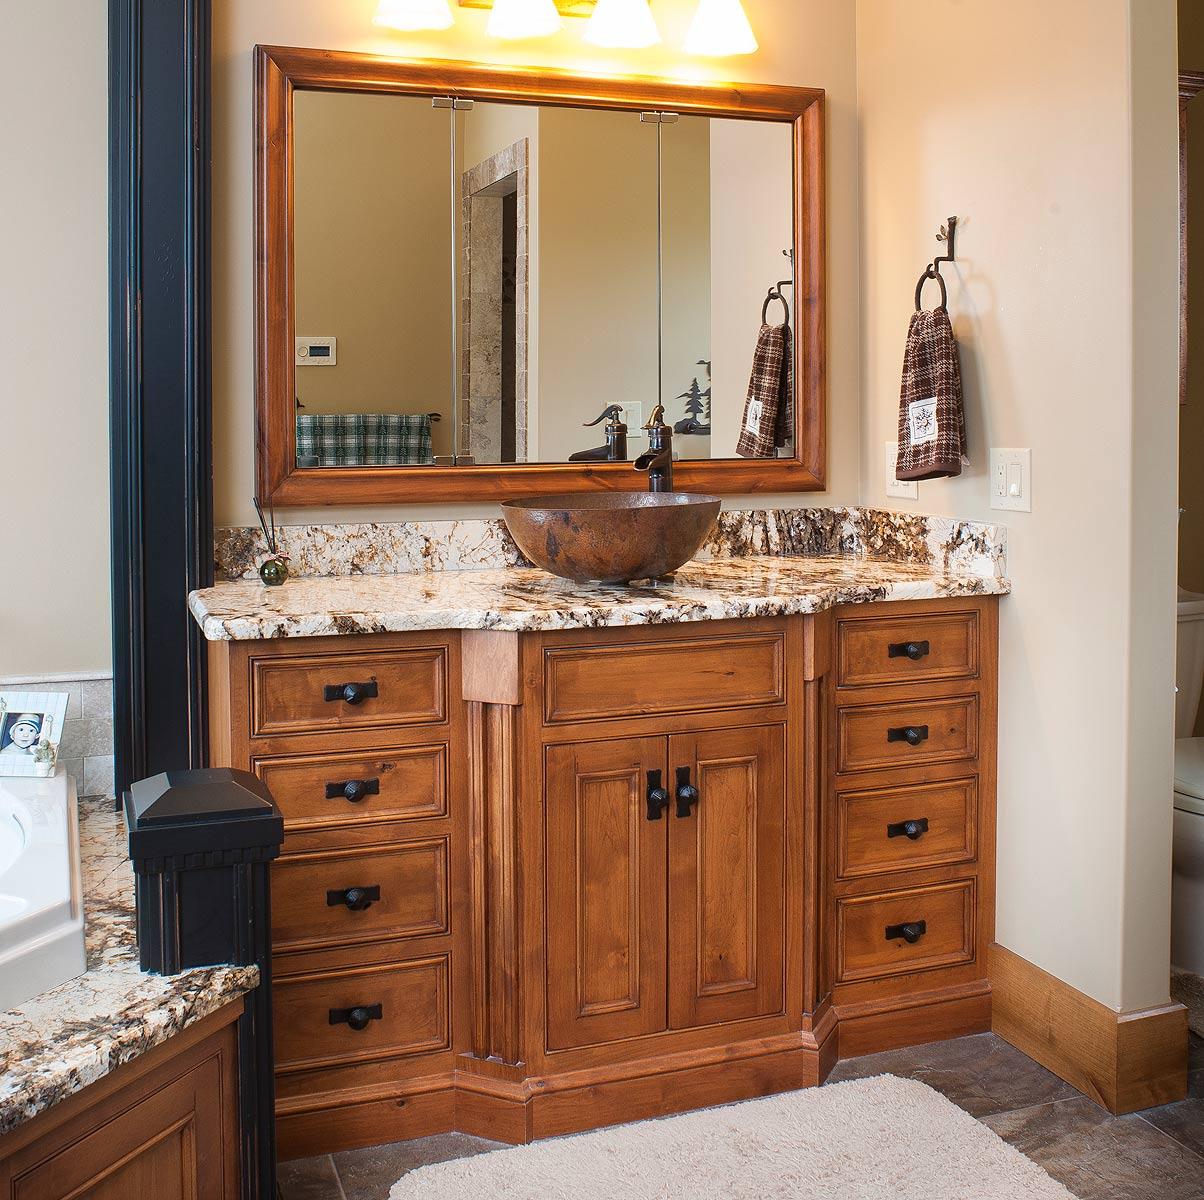 Knotty Alder Wood Cabinets: Knotty Alder Master Bath